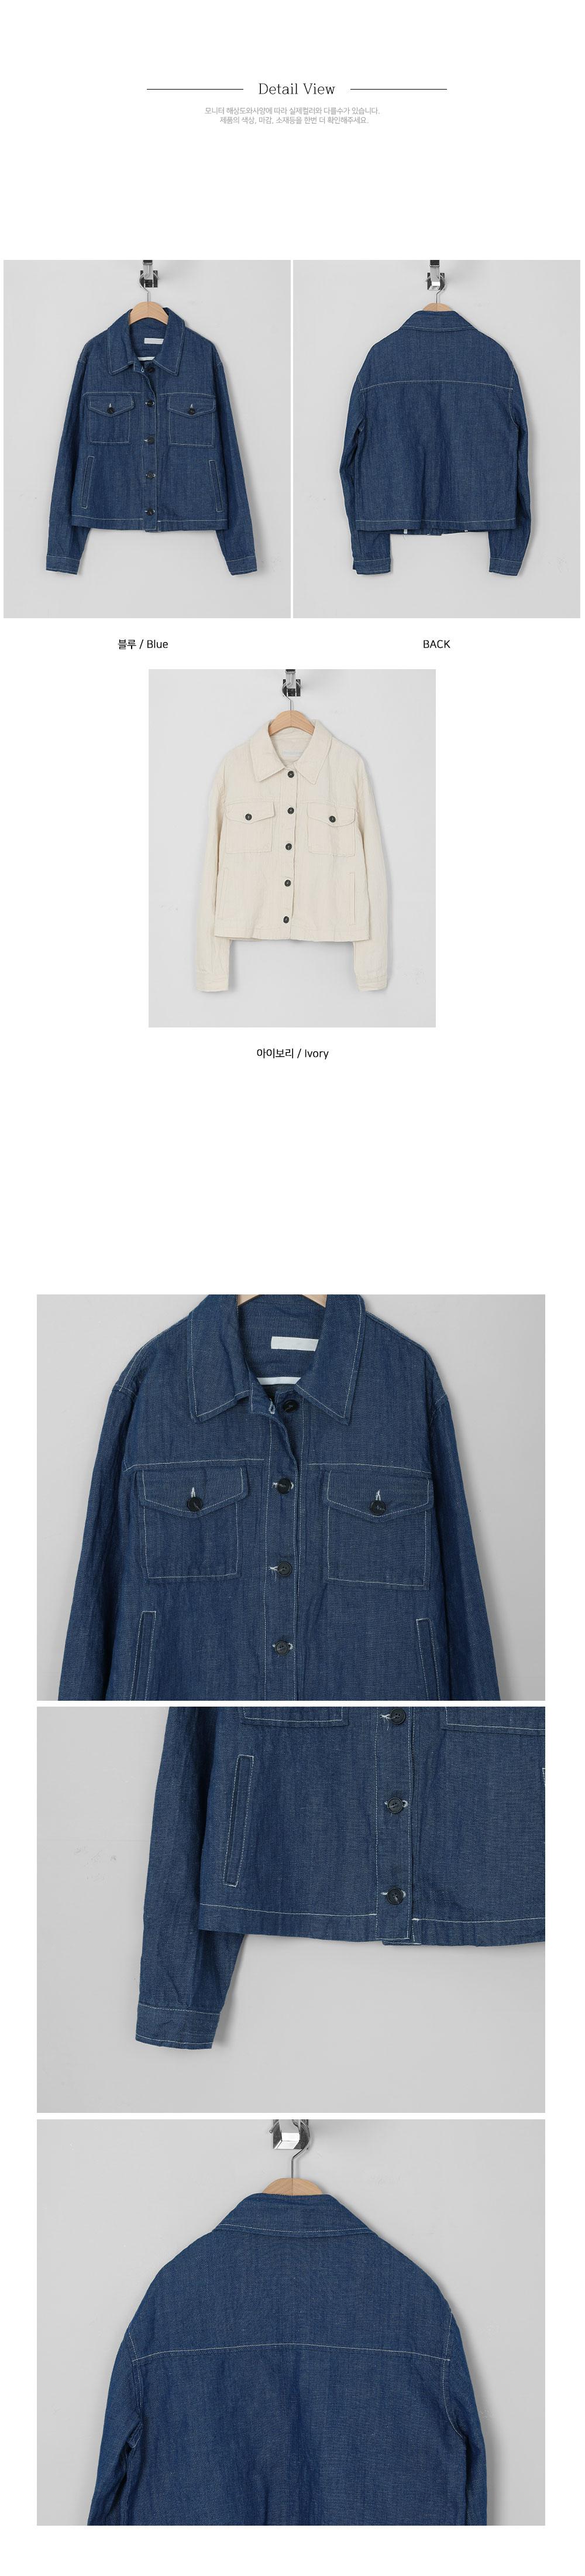 Cereal linen jacket